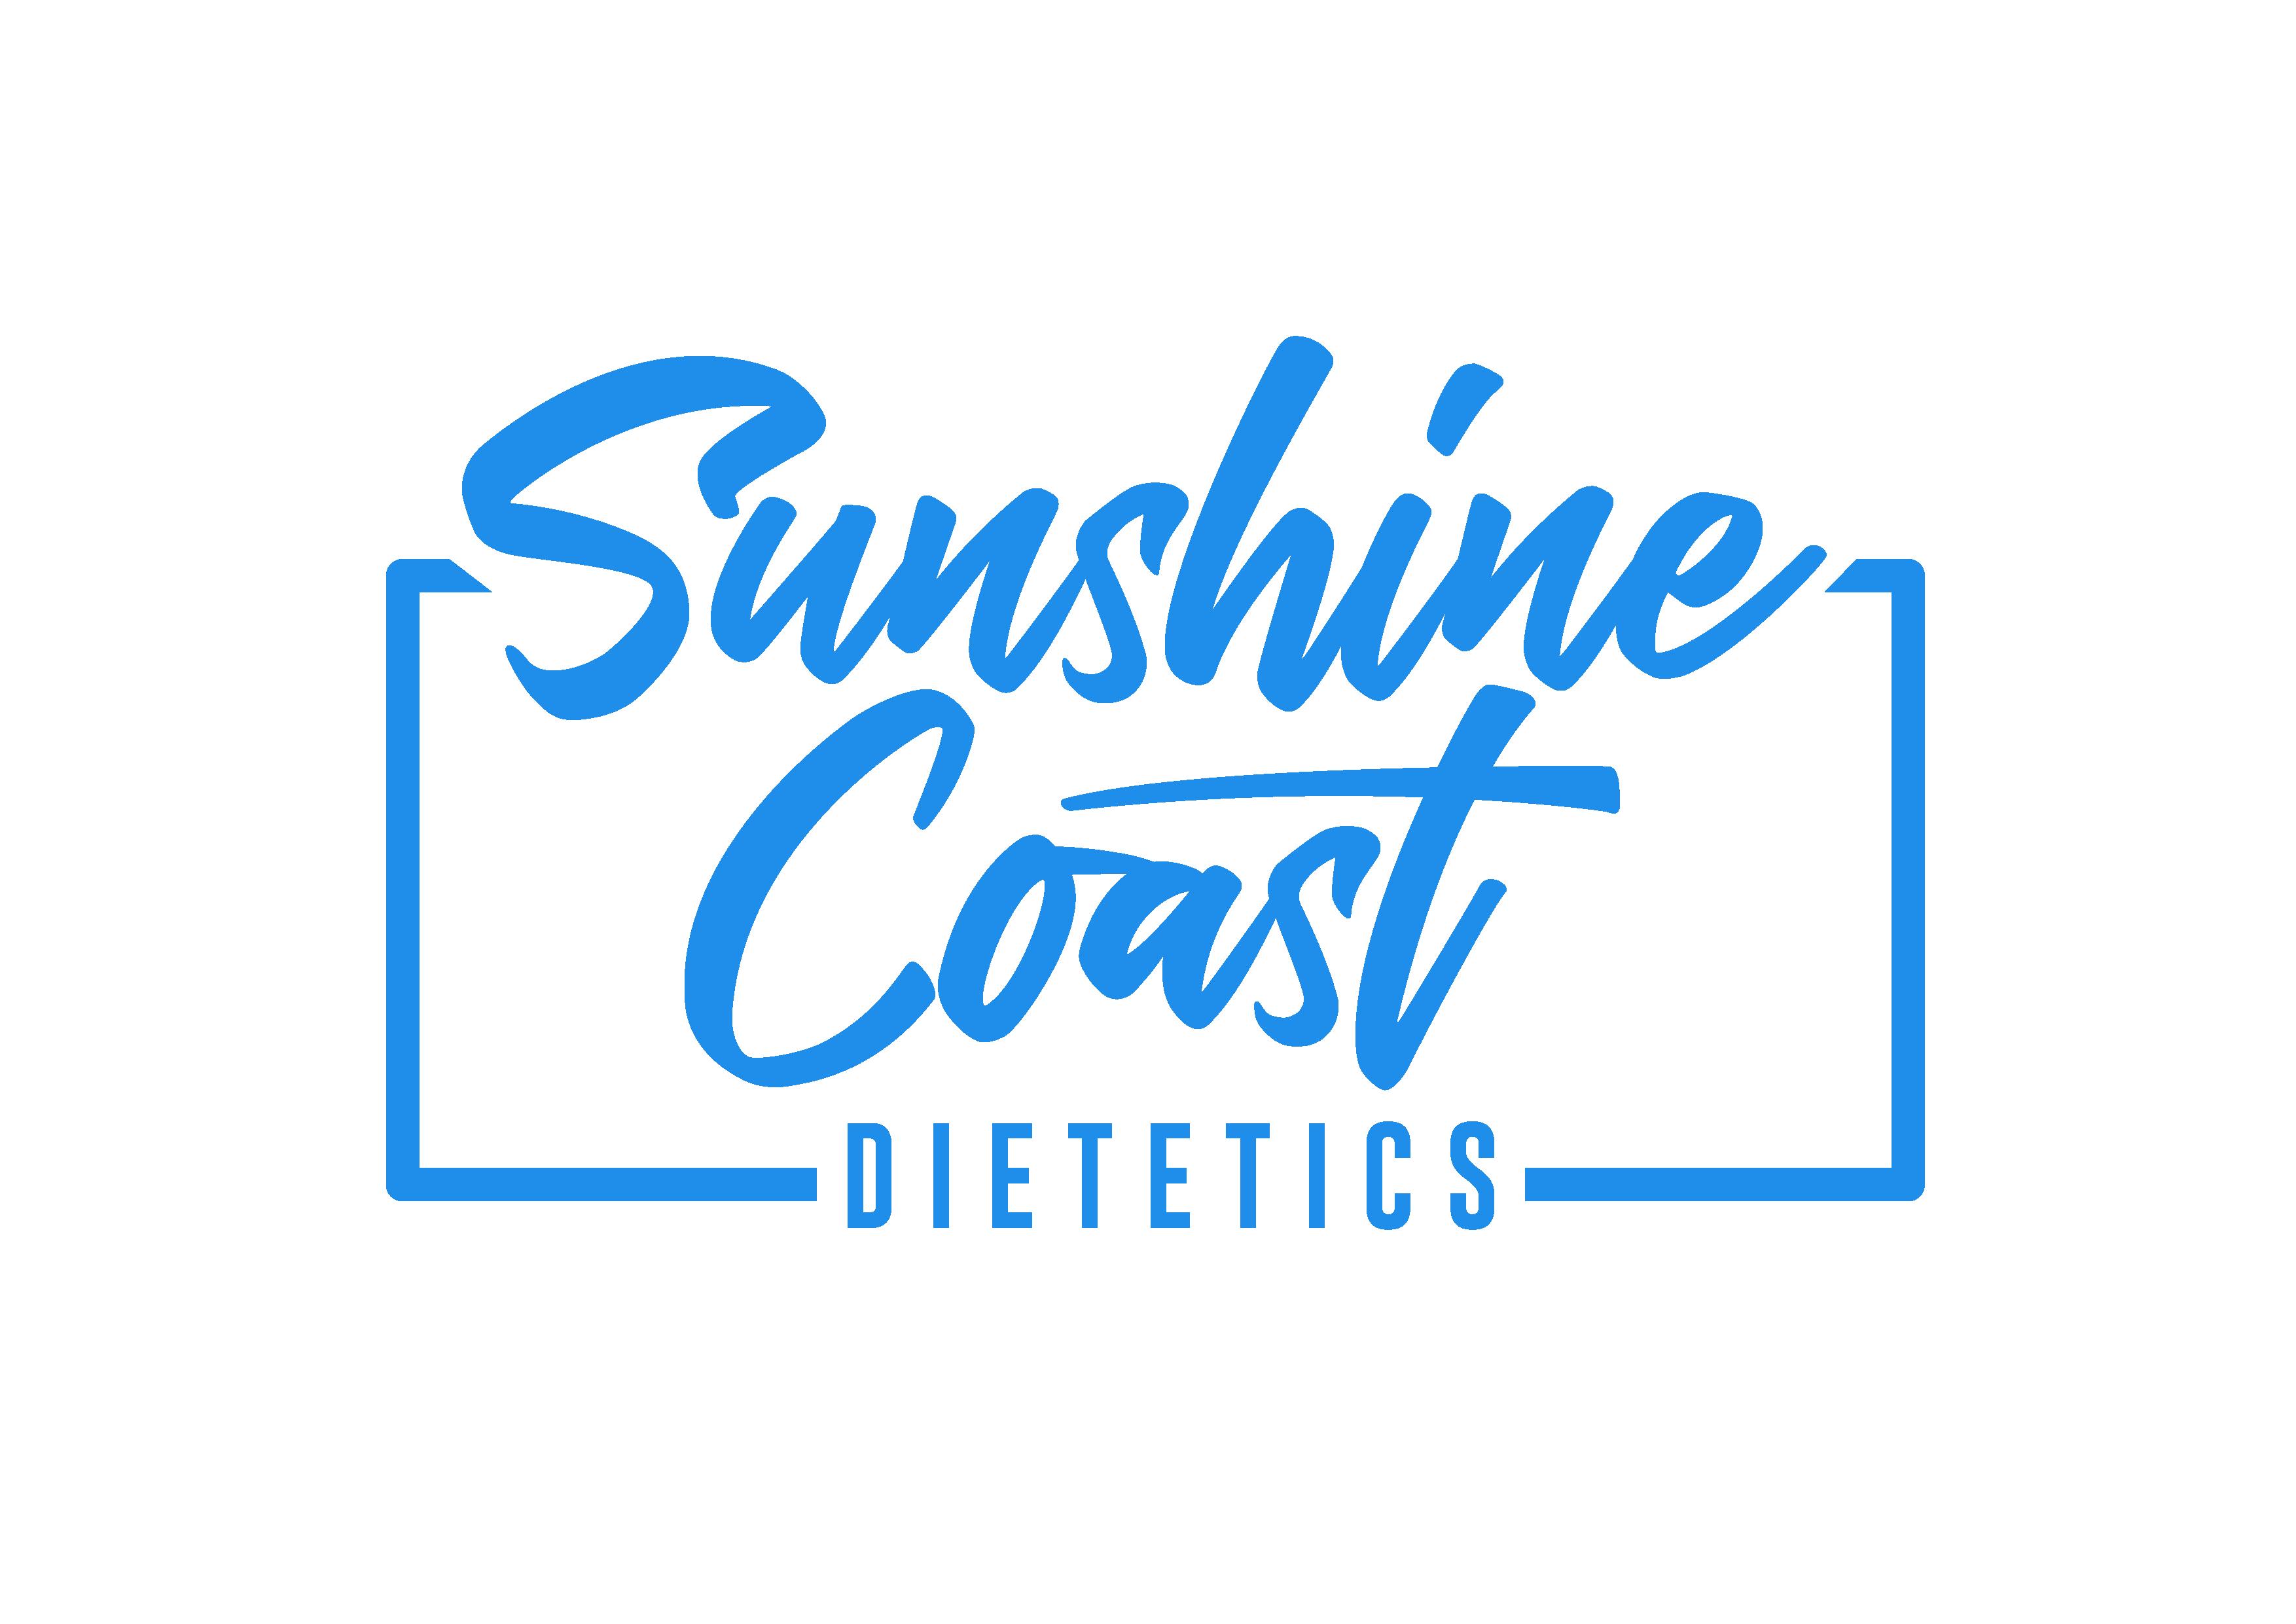 Sunshine Coast Dietetics FINAL Blue Colourway